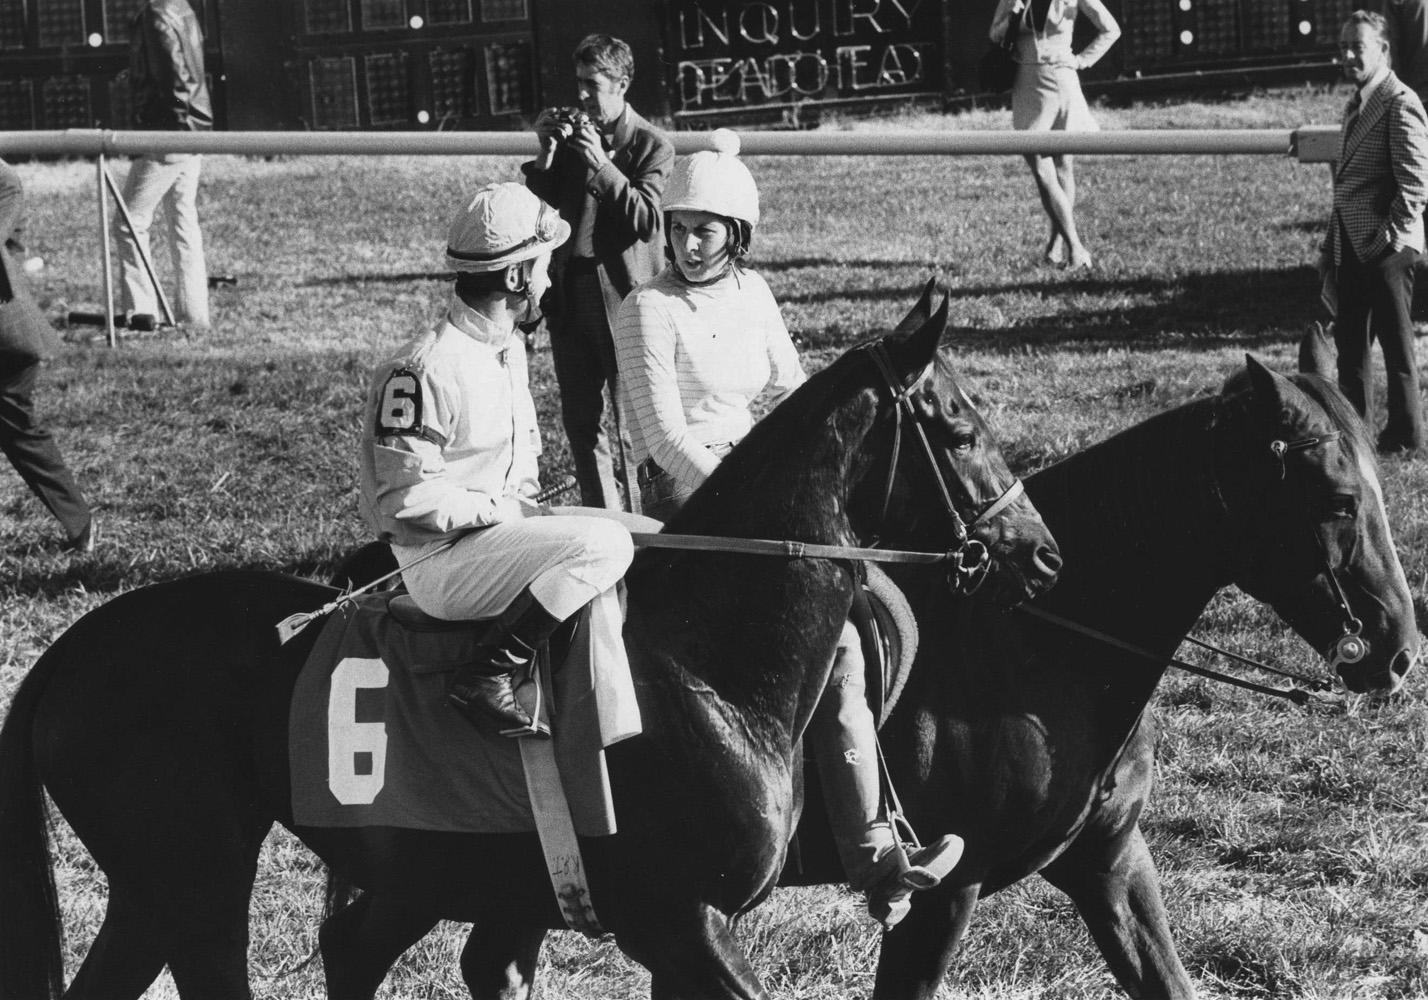 Desert Vixen (Ron Turcotte up) before the 1974 Washington, D.C. International at Laurel Park (Ray Woolfe, Jr./Museum Collection)